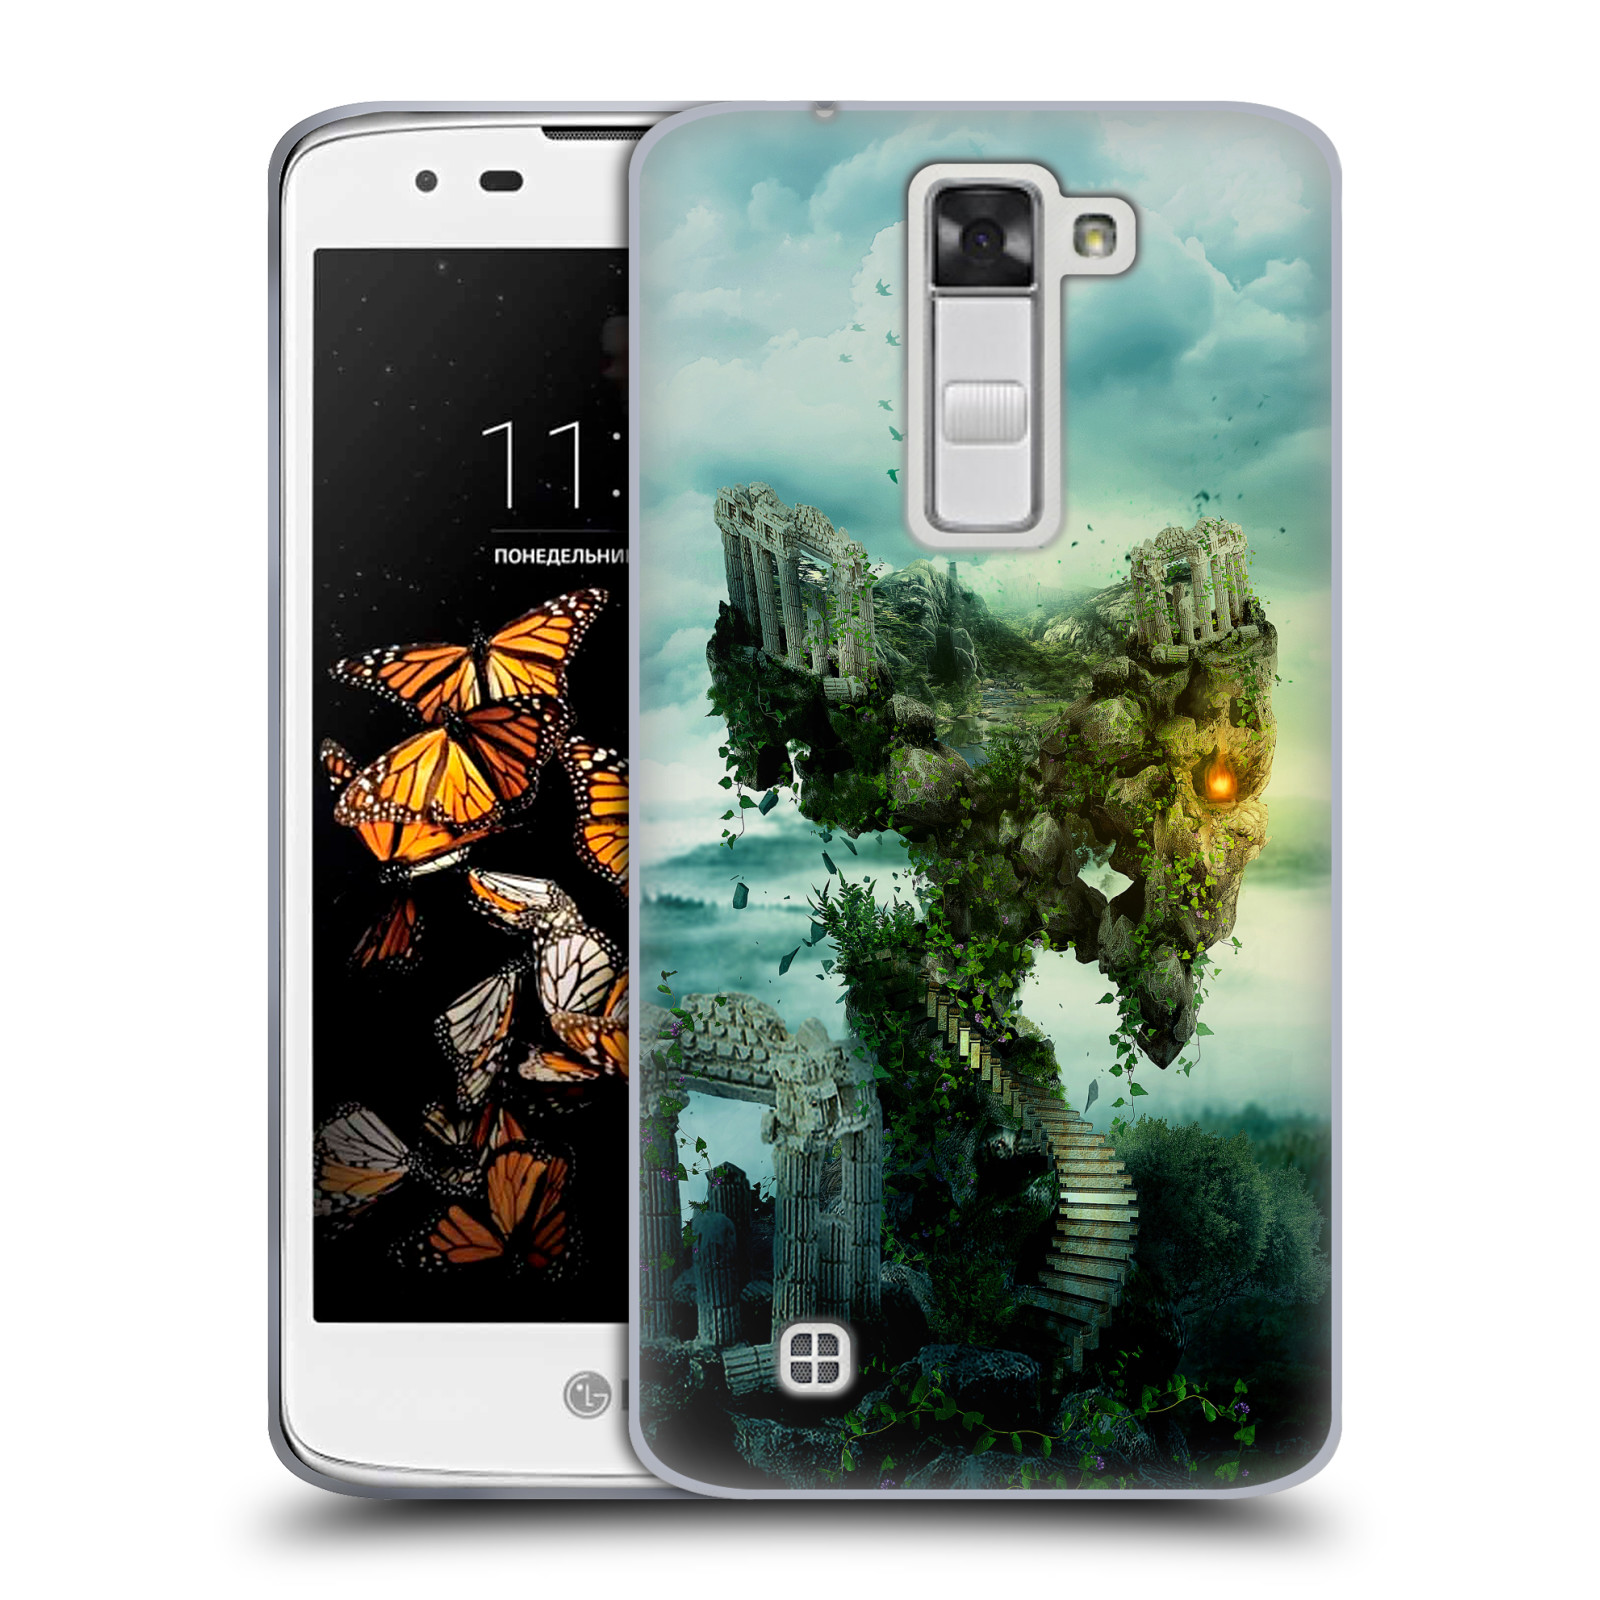 OFFICIAL-RIZA-PEKER-SKULLS-8-SOFT-GEL-CASE-FOR-LG-PHONES-2